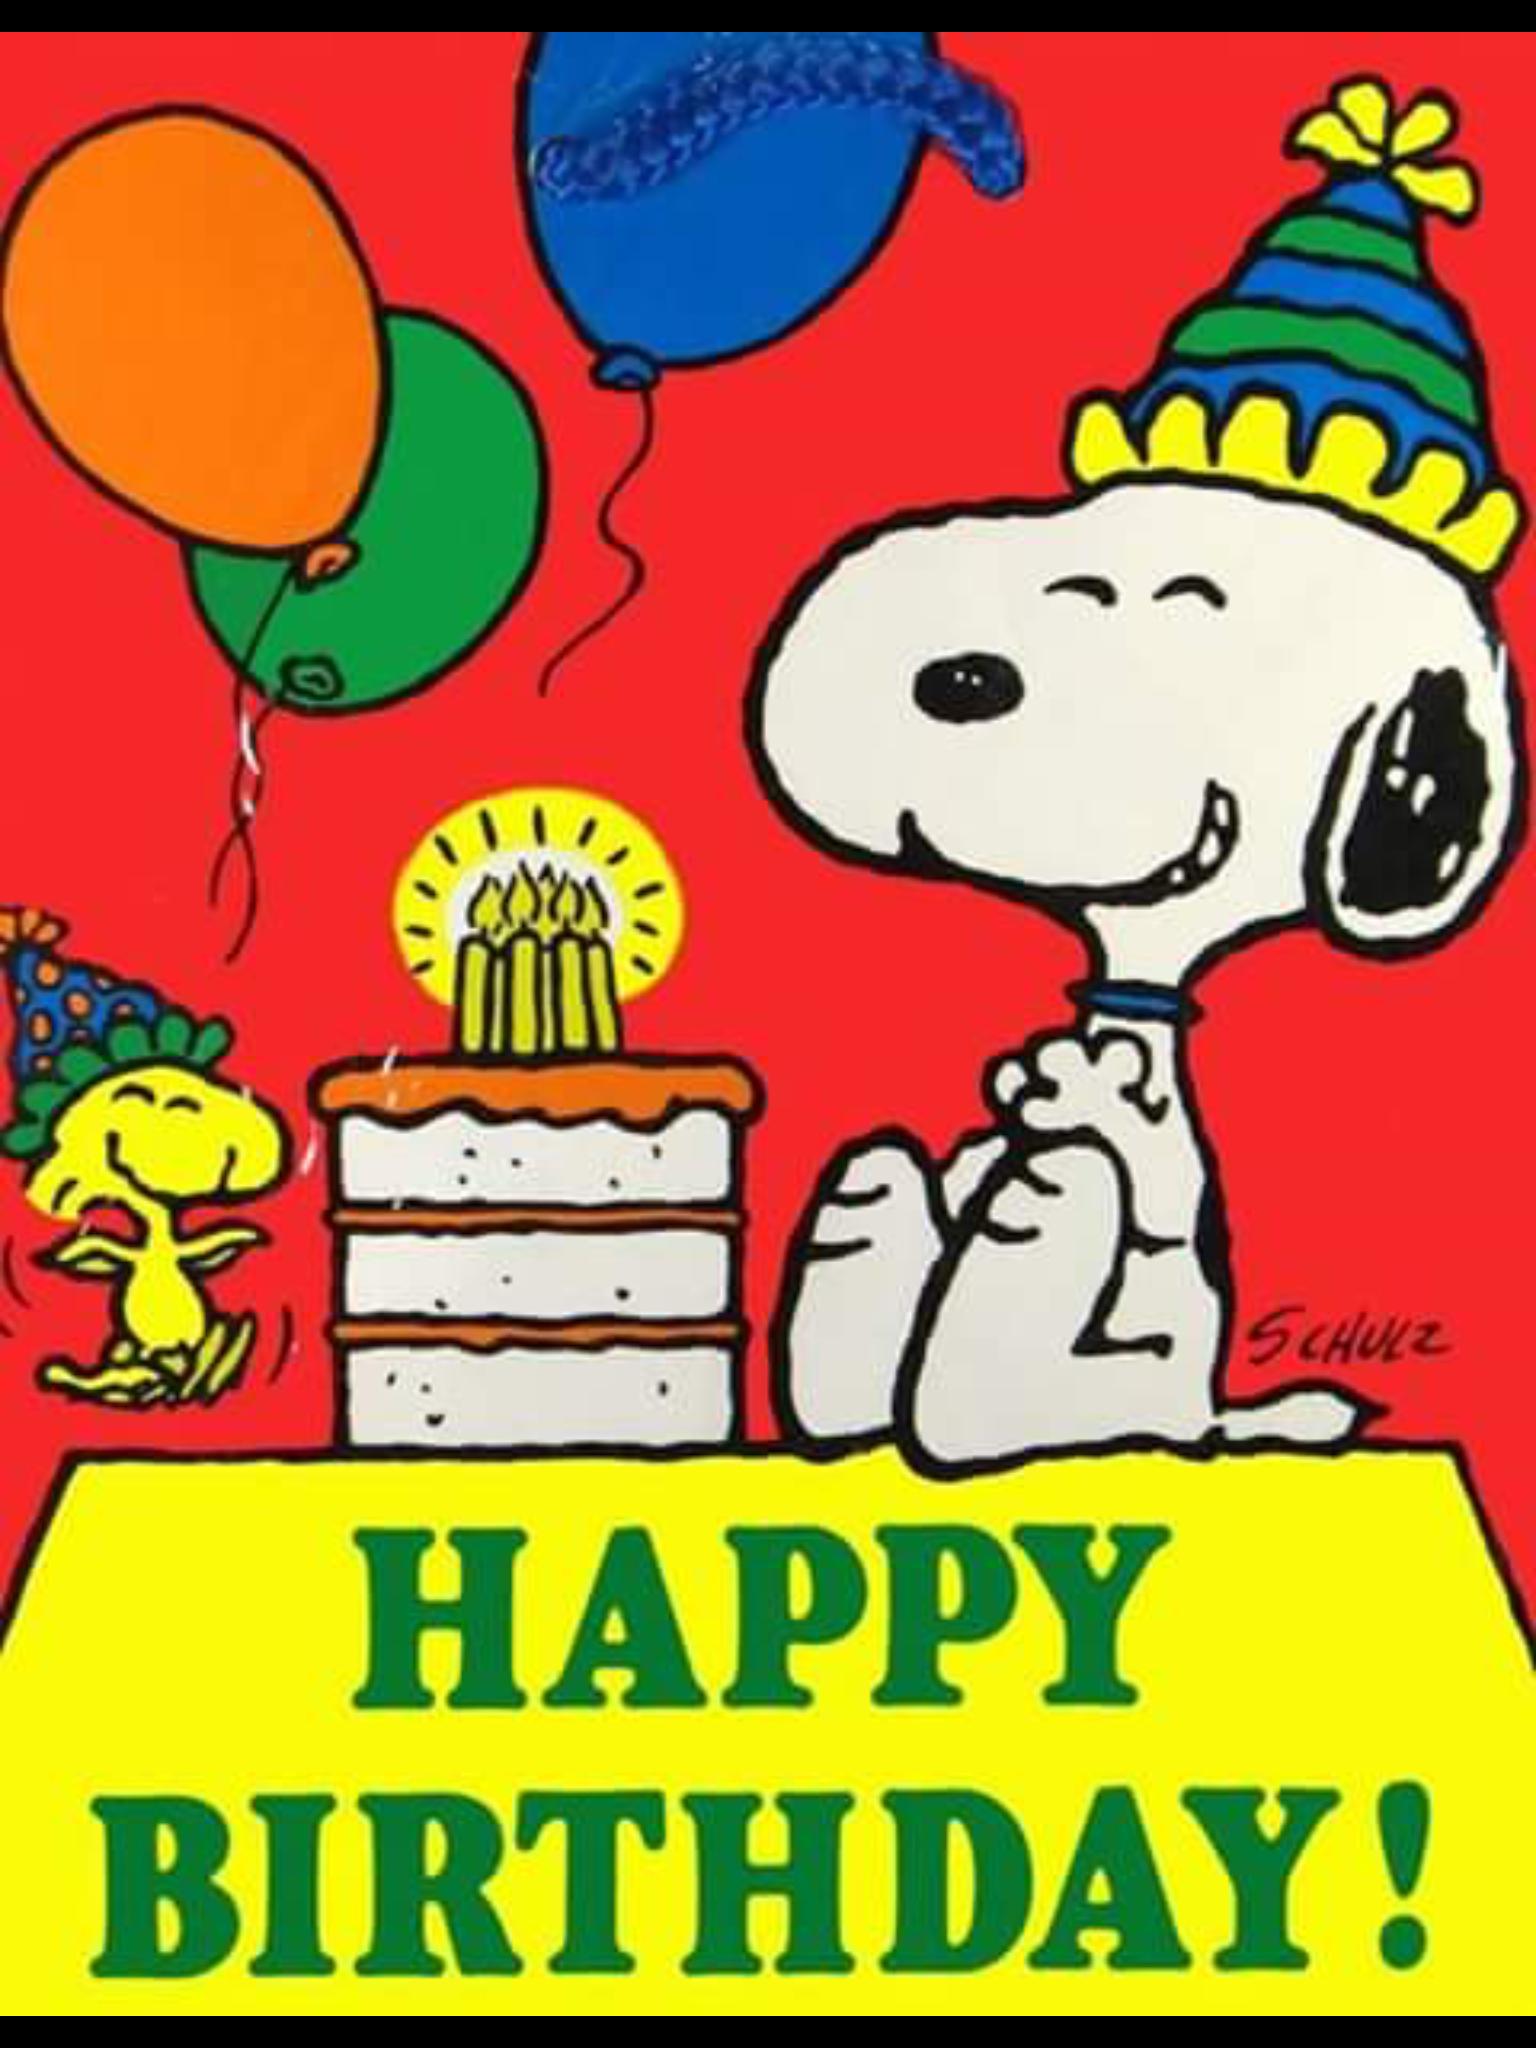 Pin De Karen Sheumaker En Greetings Feliz Cumpleanos De Snoopy Cumpleanos Snoopy Feliz Cumpleanos Nina